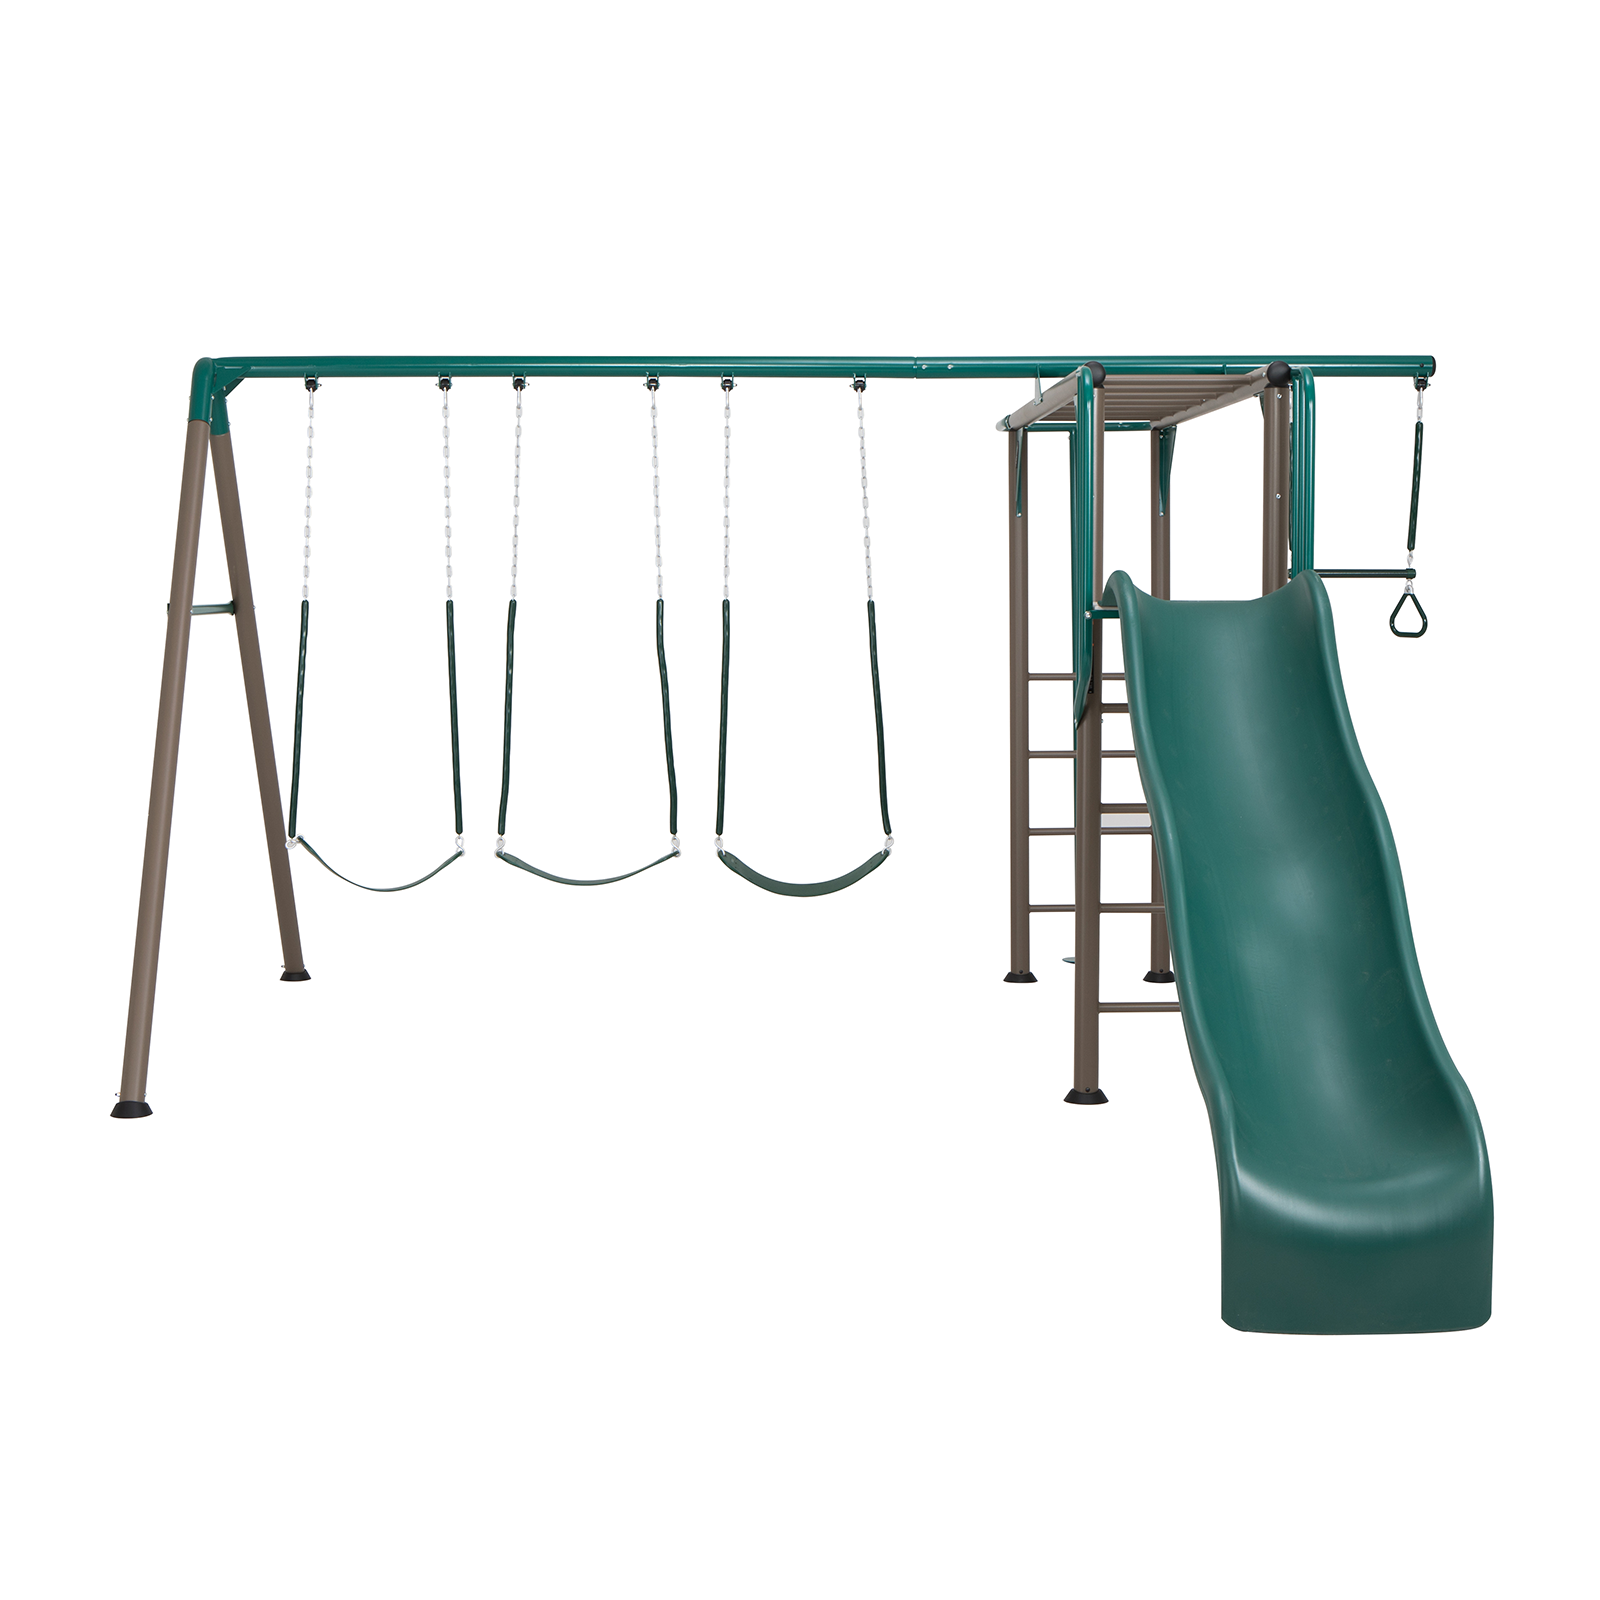 Swing Slide Climb Lifetime Monkey Bar Swing Set Play Equipment